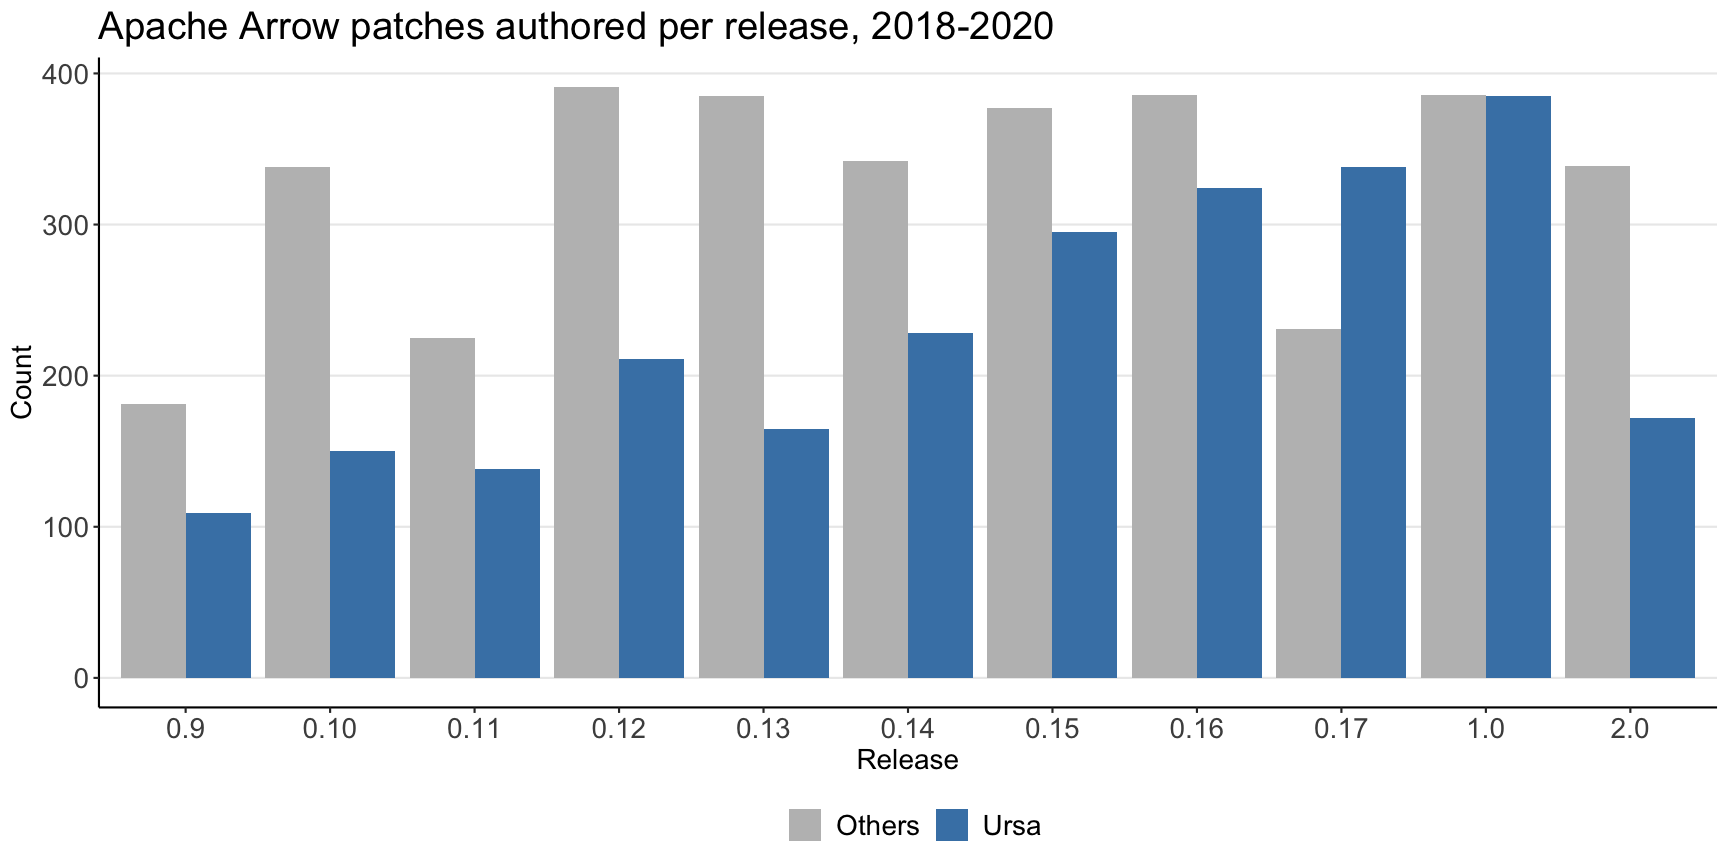 Apache Arrow patches authored per release, 2018-2020